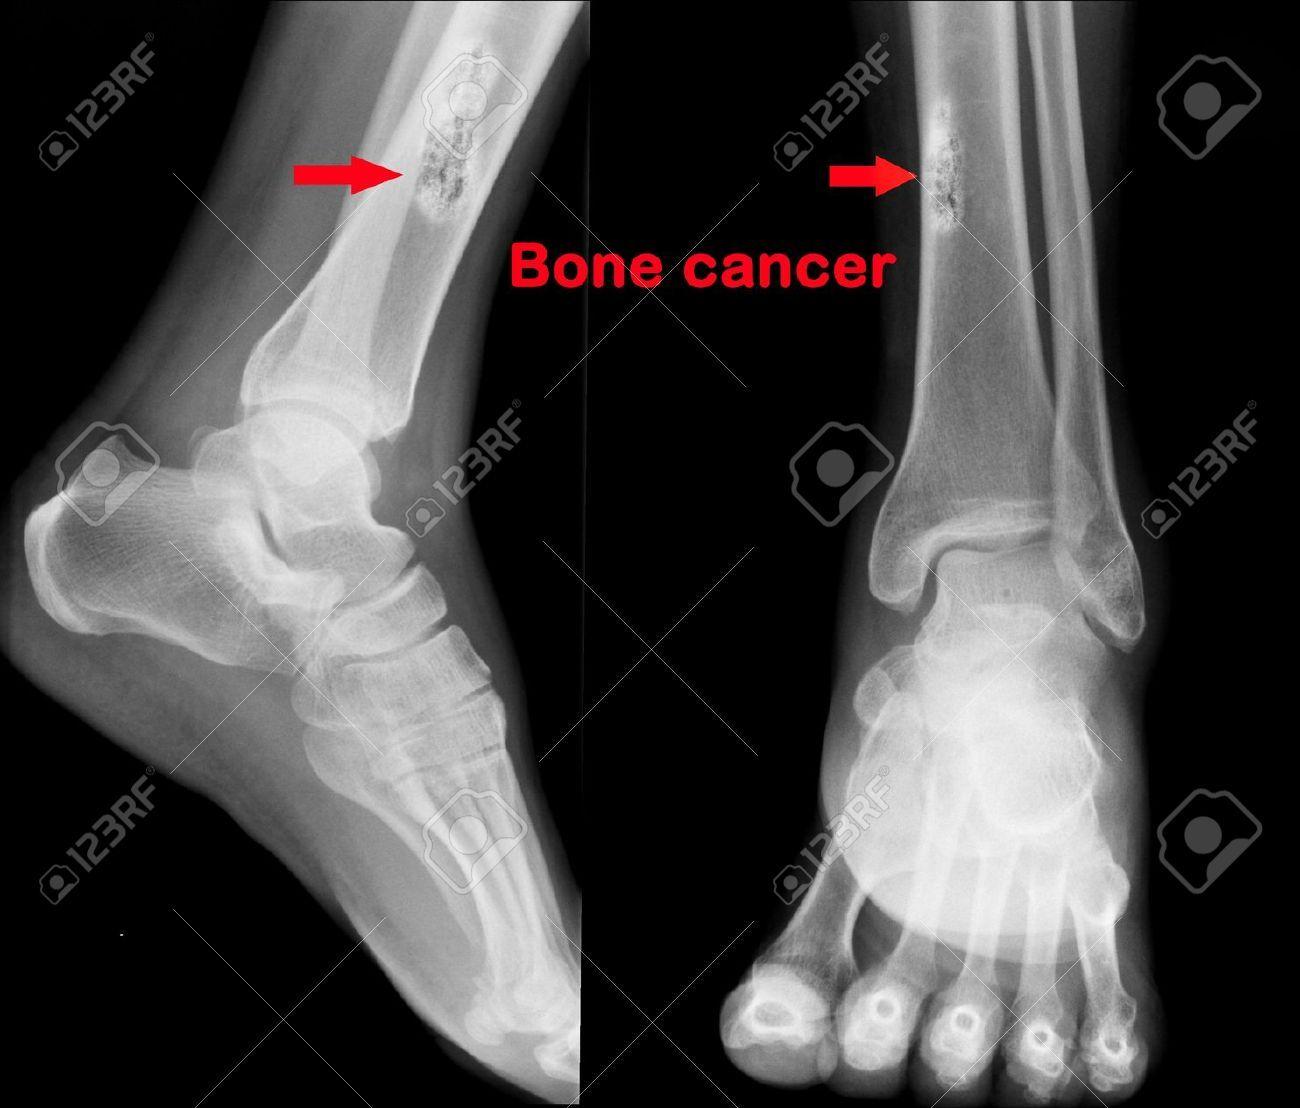 X Ray Of Bone Cancer In Tibia